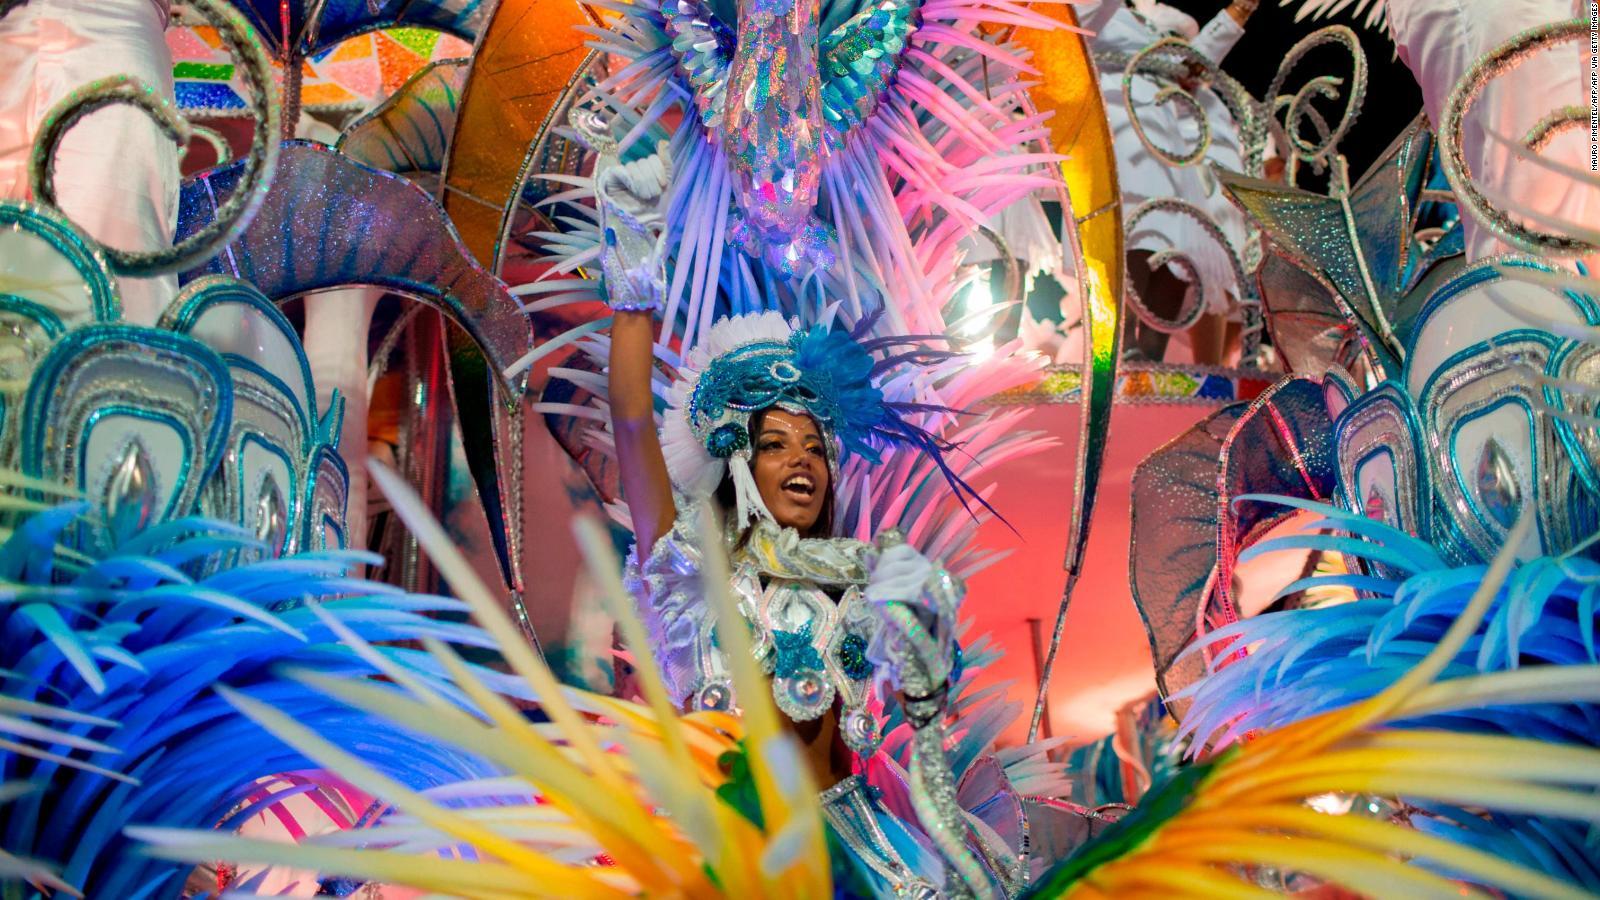 Alcalde de Río de Janeiro anuncia cancelación de desfile de carnaval de julio